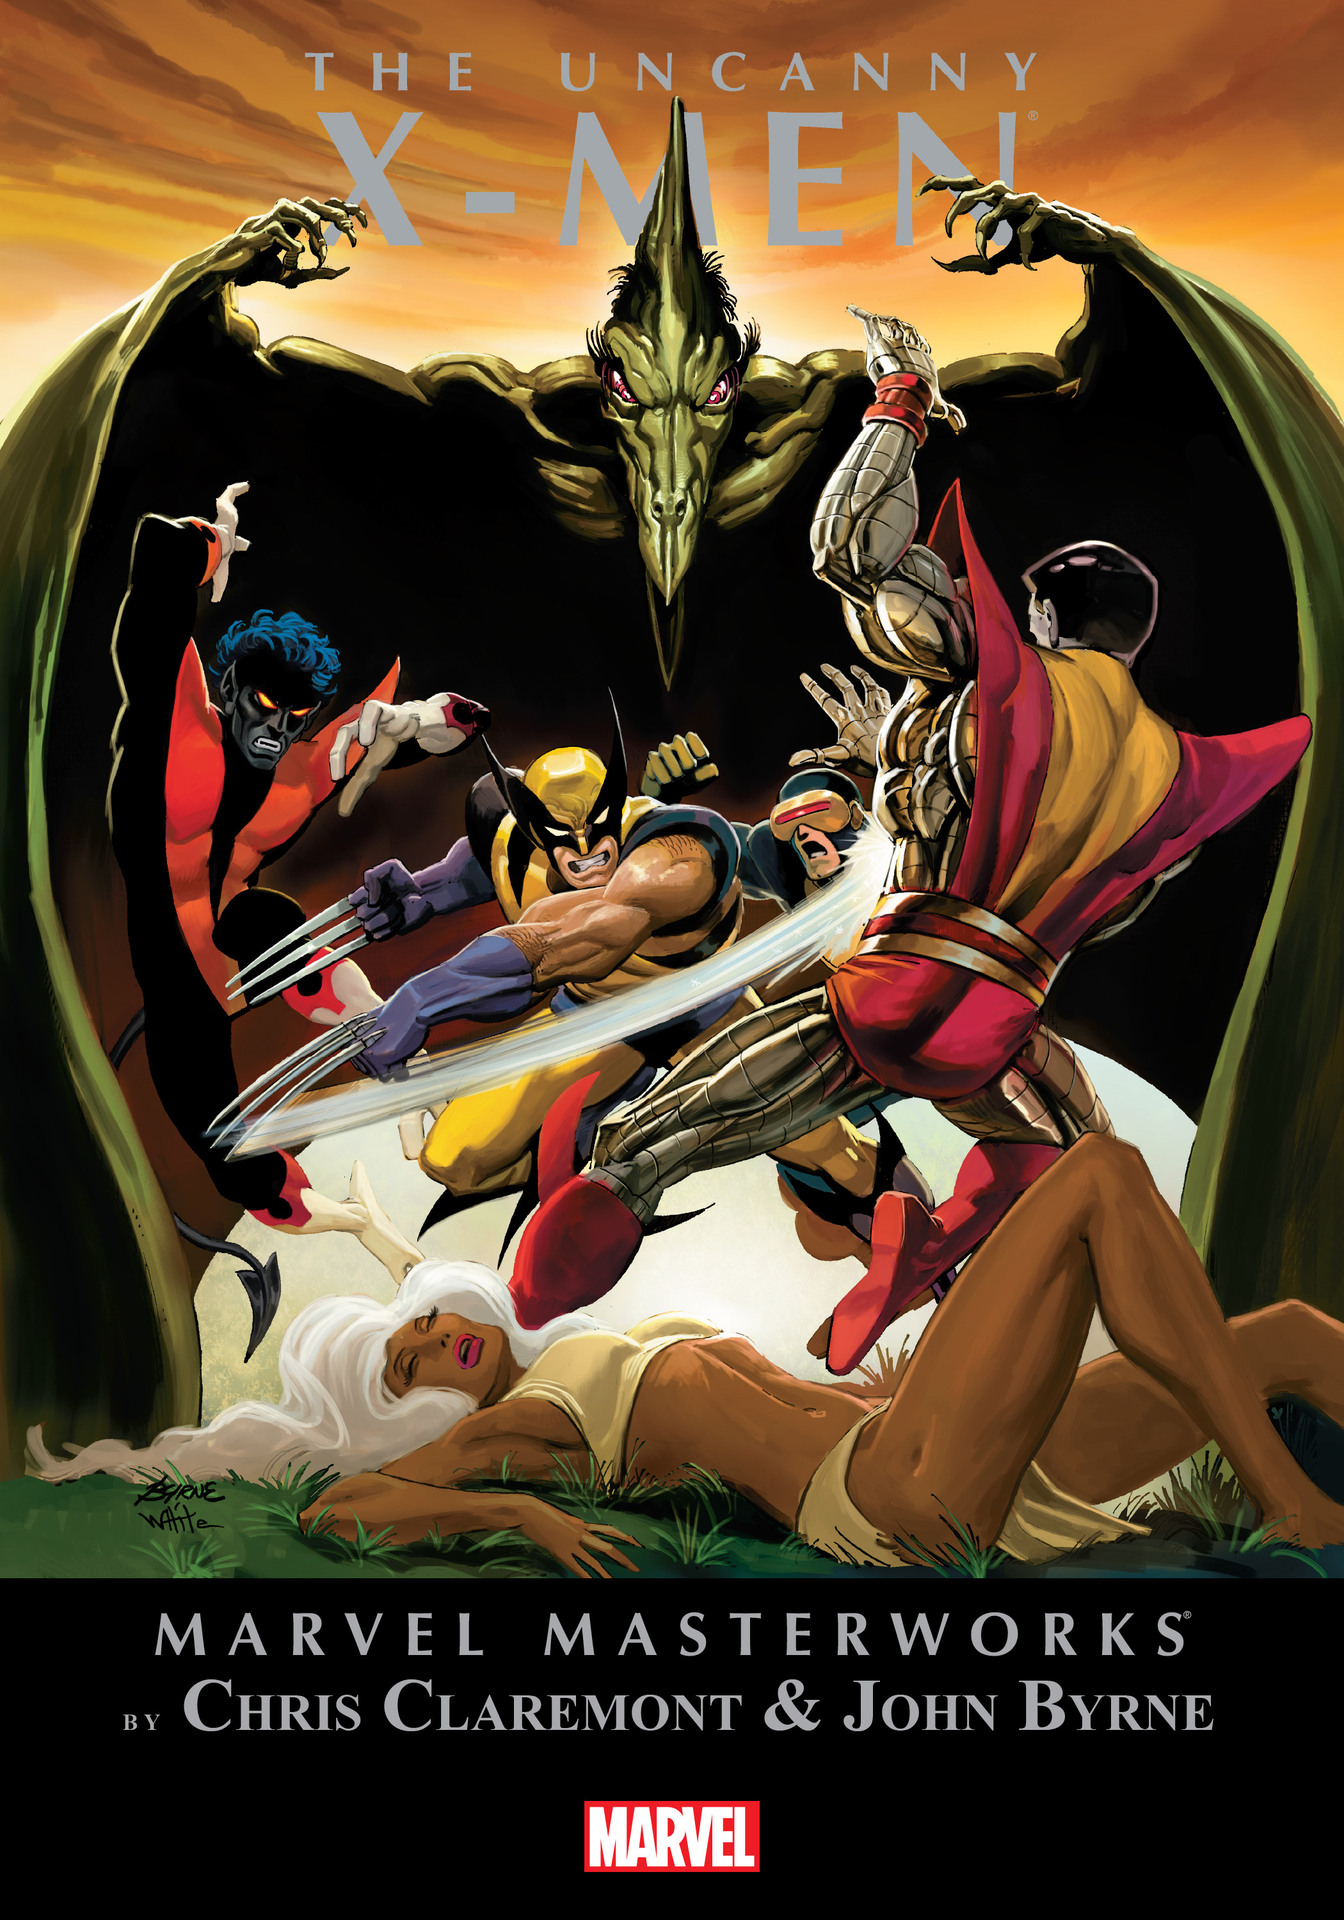 Marvel Masterworks: The Uncanny X-Men, Vol. 3